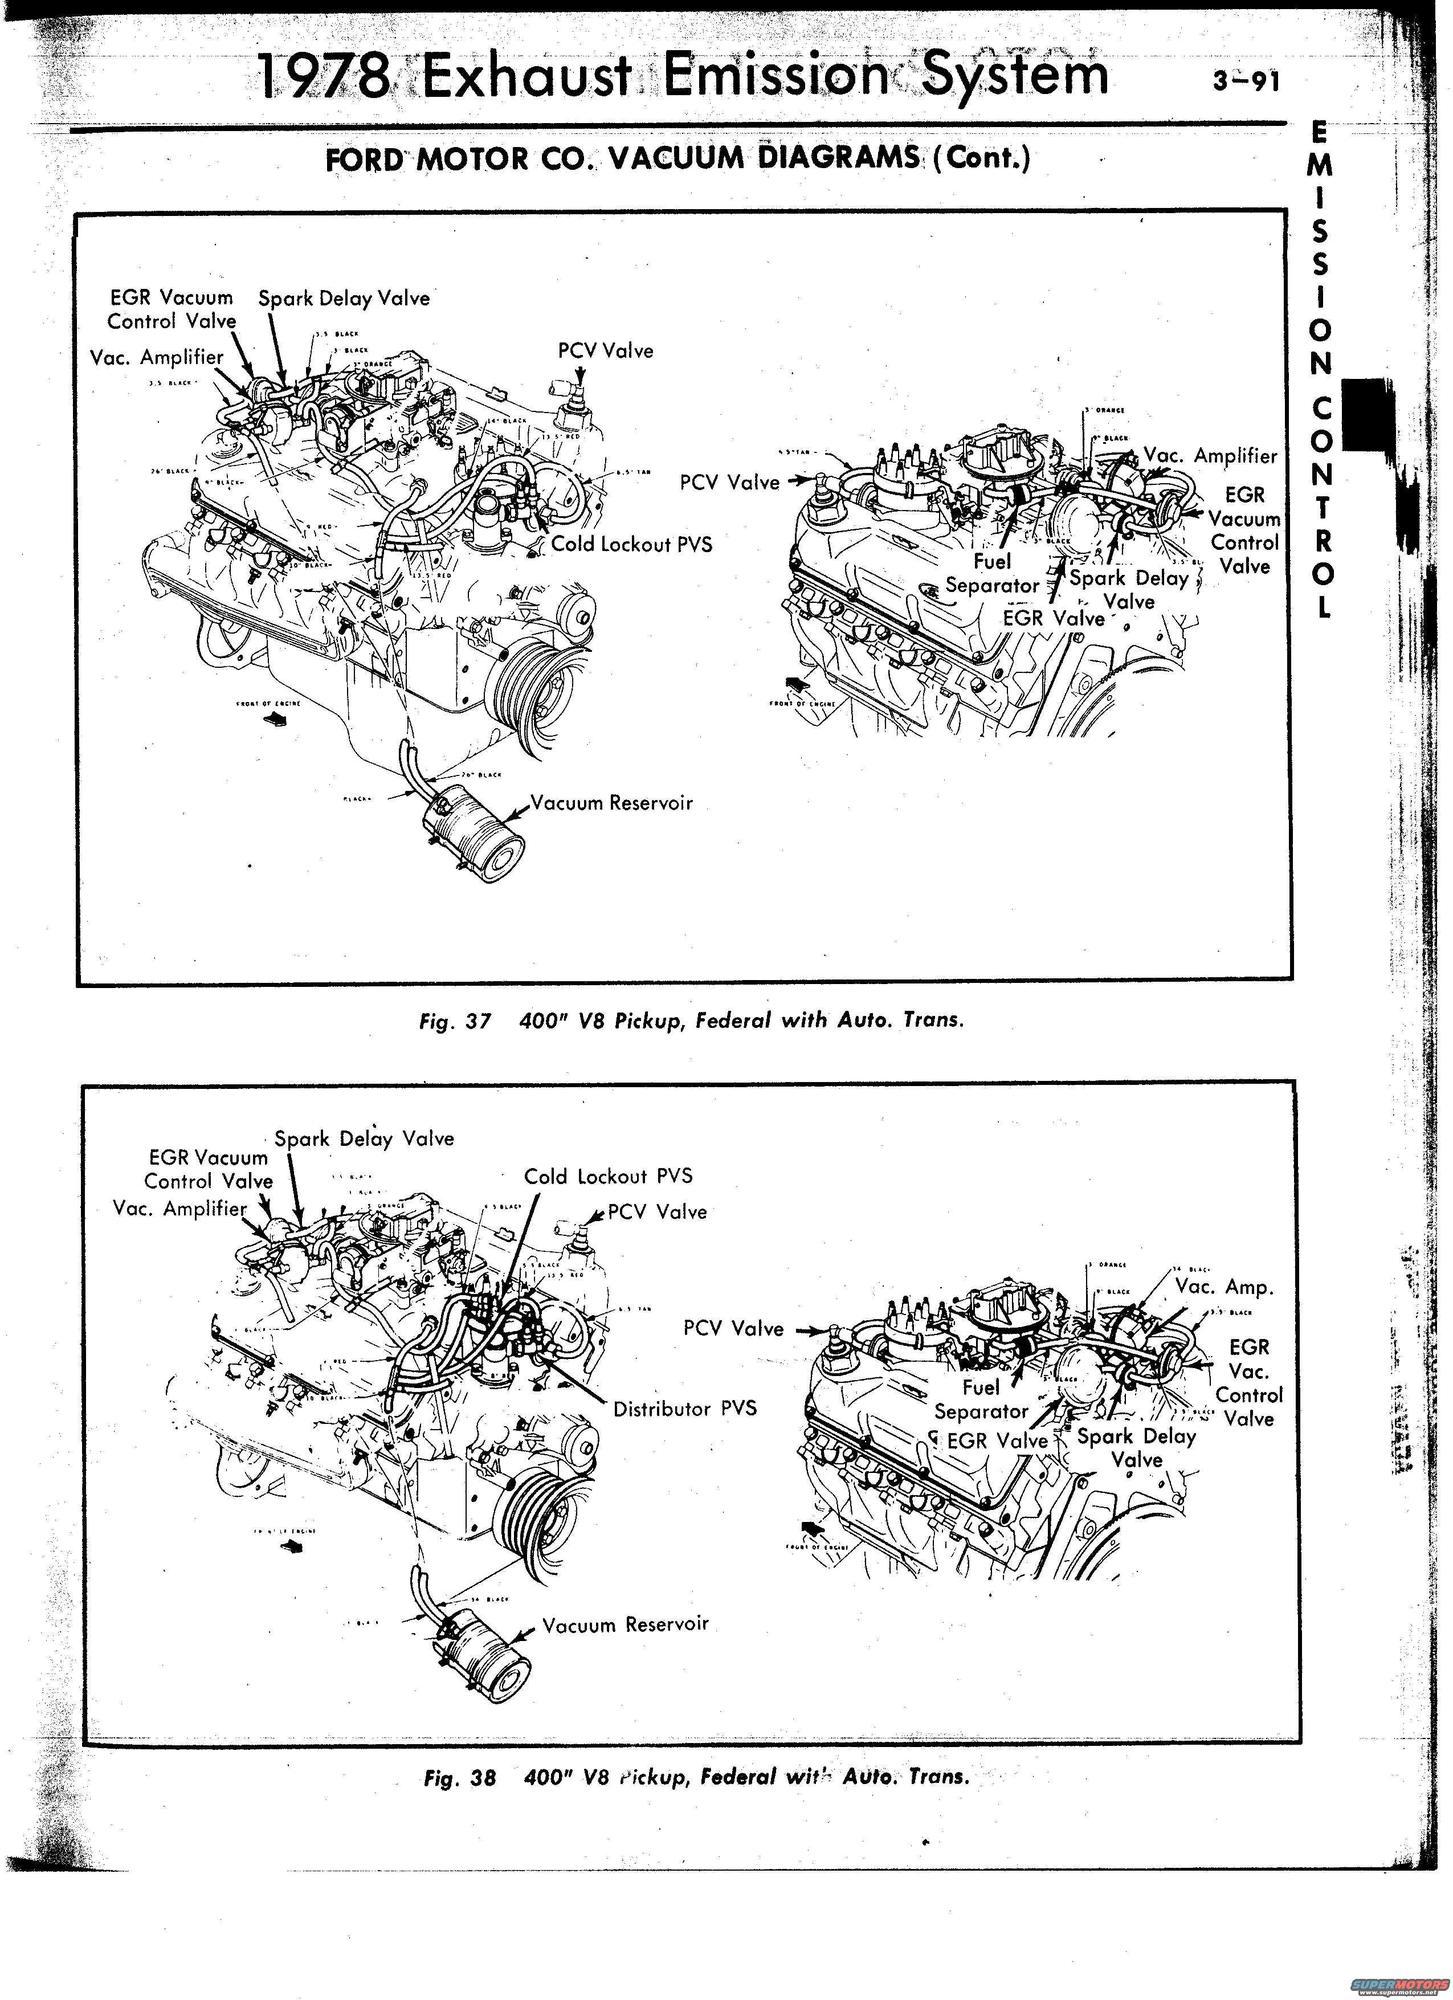 1979 ford bronco engine diagram sz 8287  1978 ford engine diagram schematic wiring  1978 ford engine diagram schematic wiring